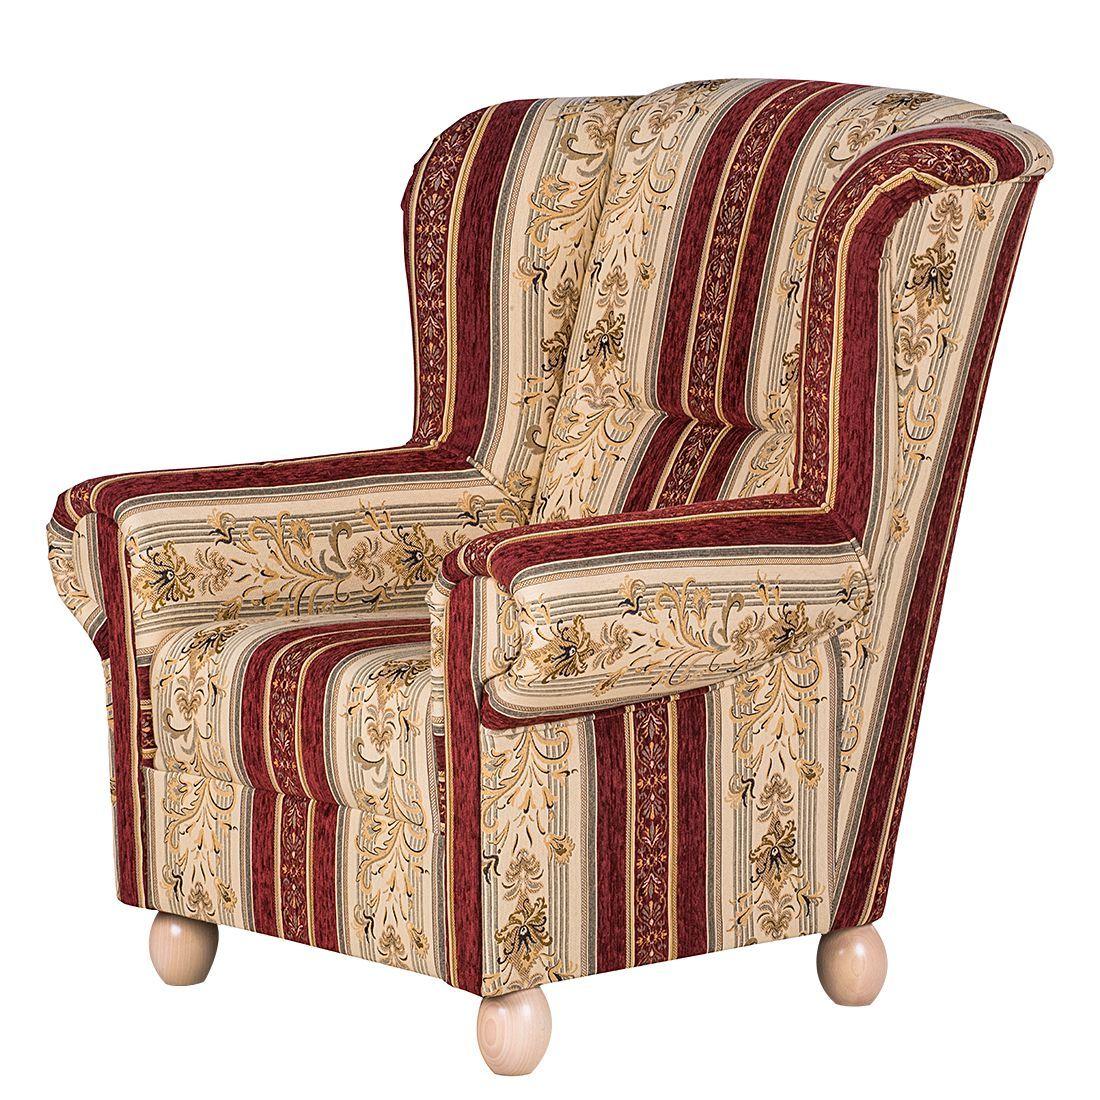 ohrensessel isabelle armchair pinterest sessel ohrensessel und hocker. Black Bedroom Furniture Sets. Home Design Ideas